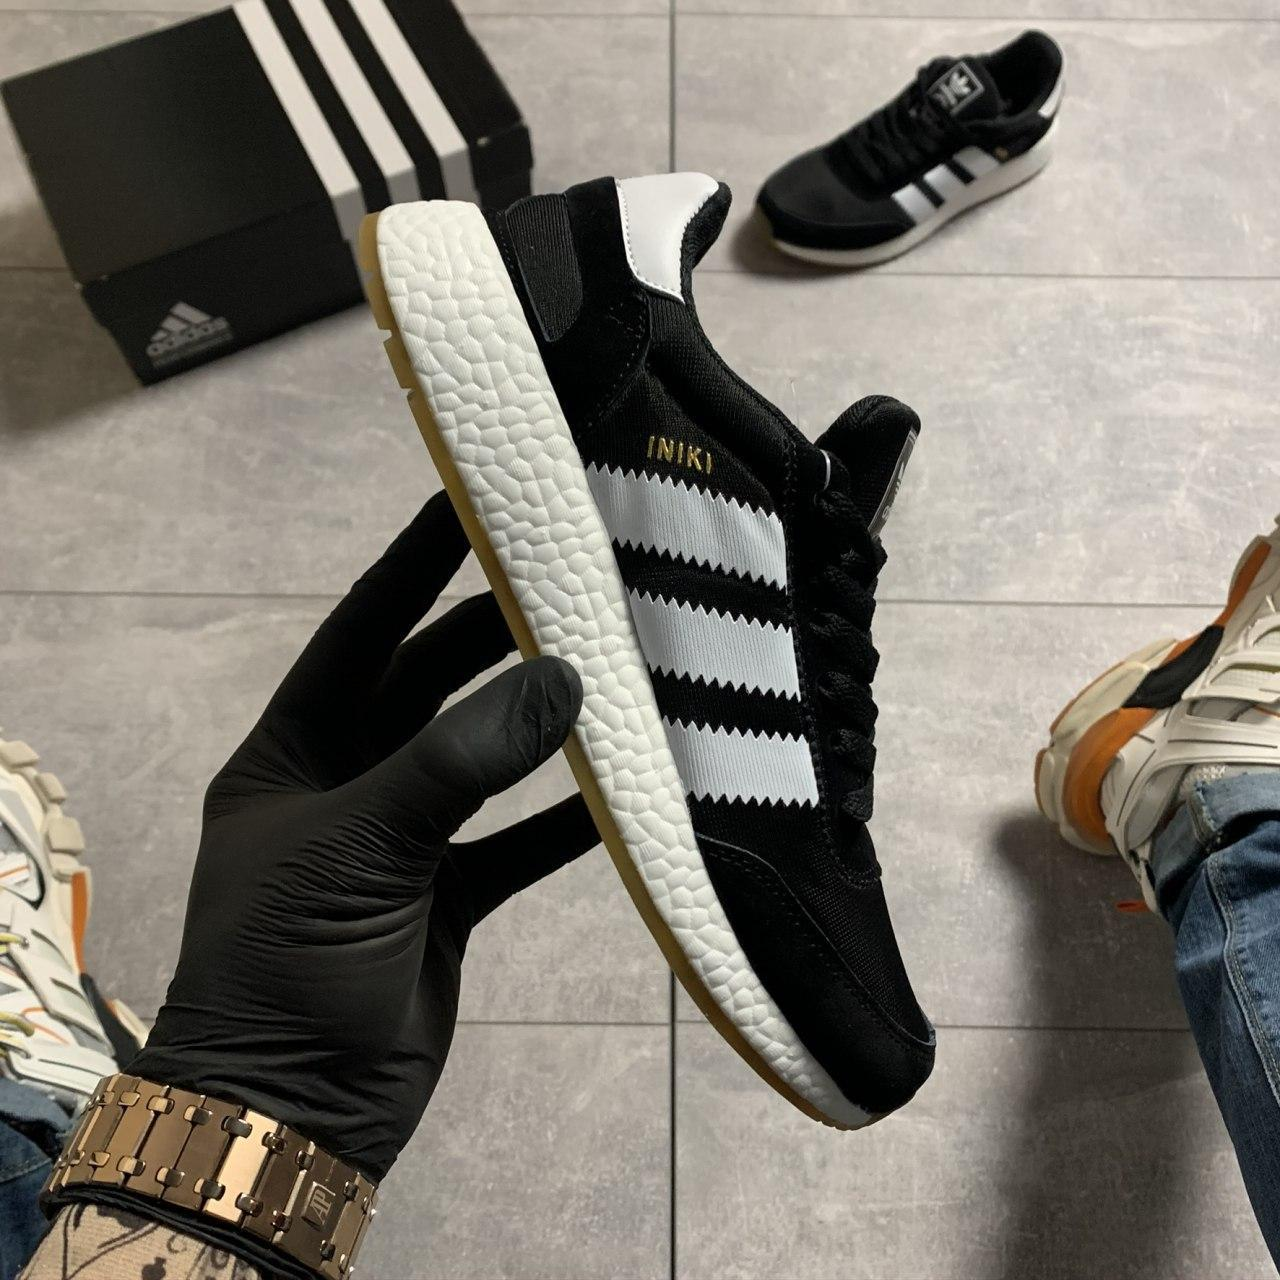 🔥 ВИДЕО ОБЗОР 🔥 Кроссовки Adidas Iniki Black White Адидас Иники 🔥 Адидас женские кроссовки 🔥